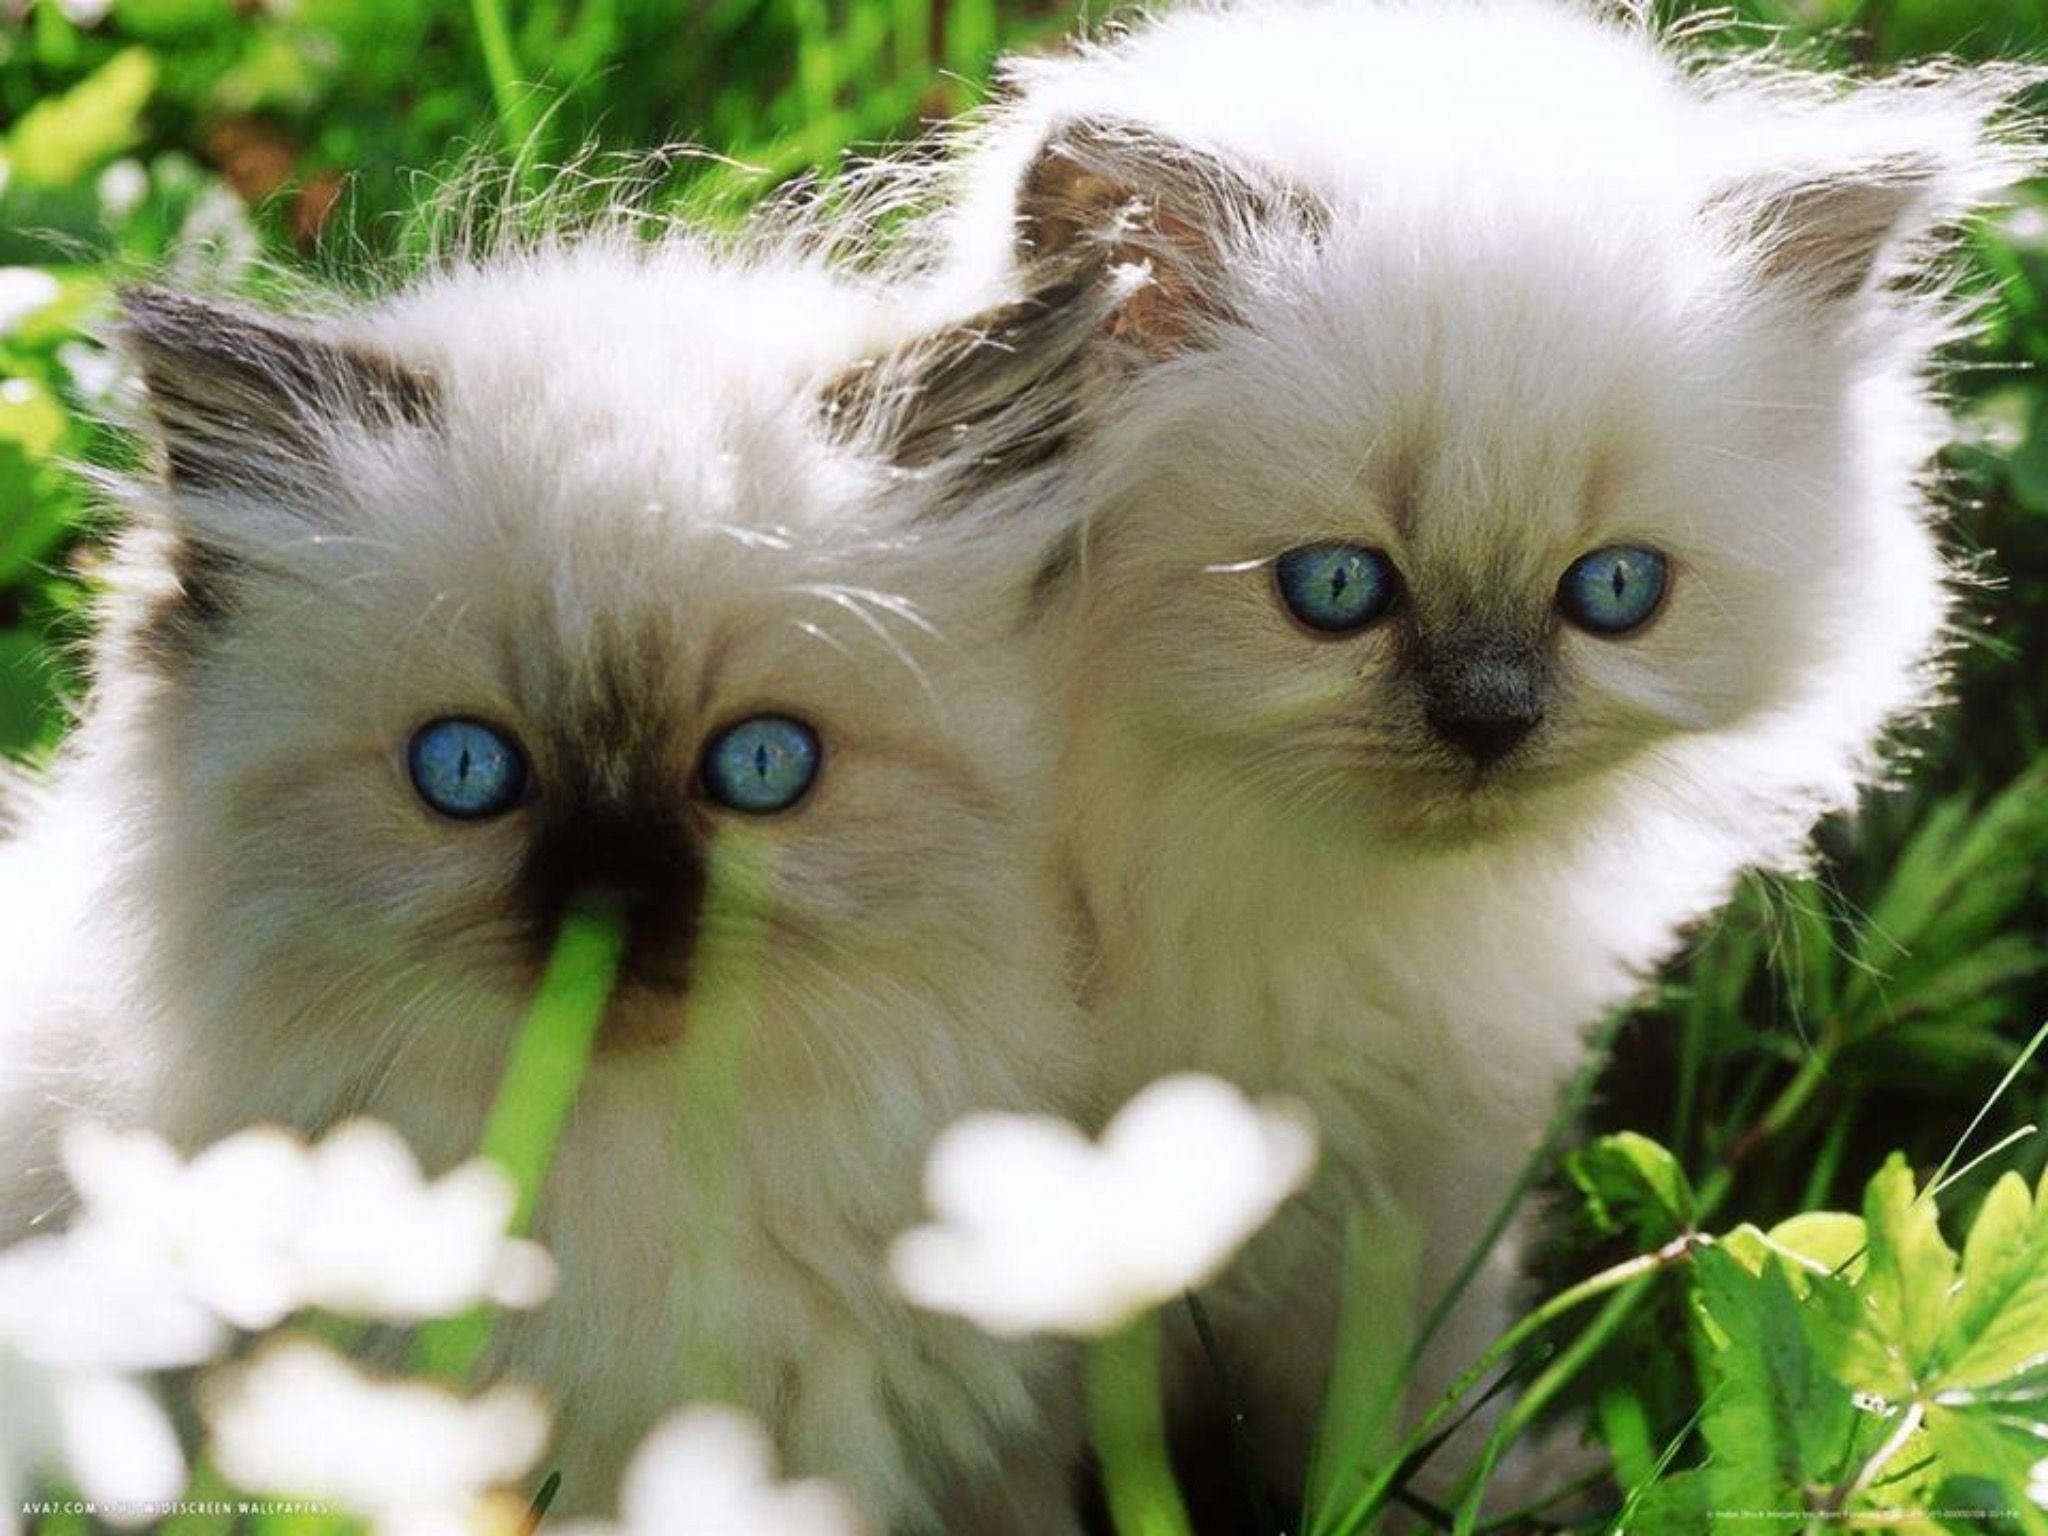 Two White Persian Kittens Sweden Photographic Print By Bjorn Forsberg Cutest Kitten Breeds Kitten Breeds Kittens Cutest